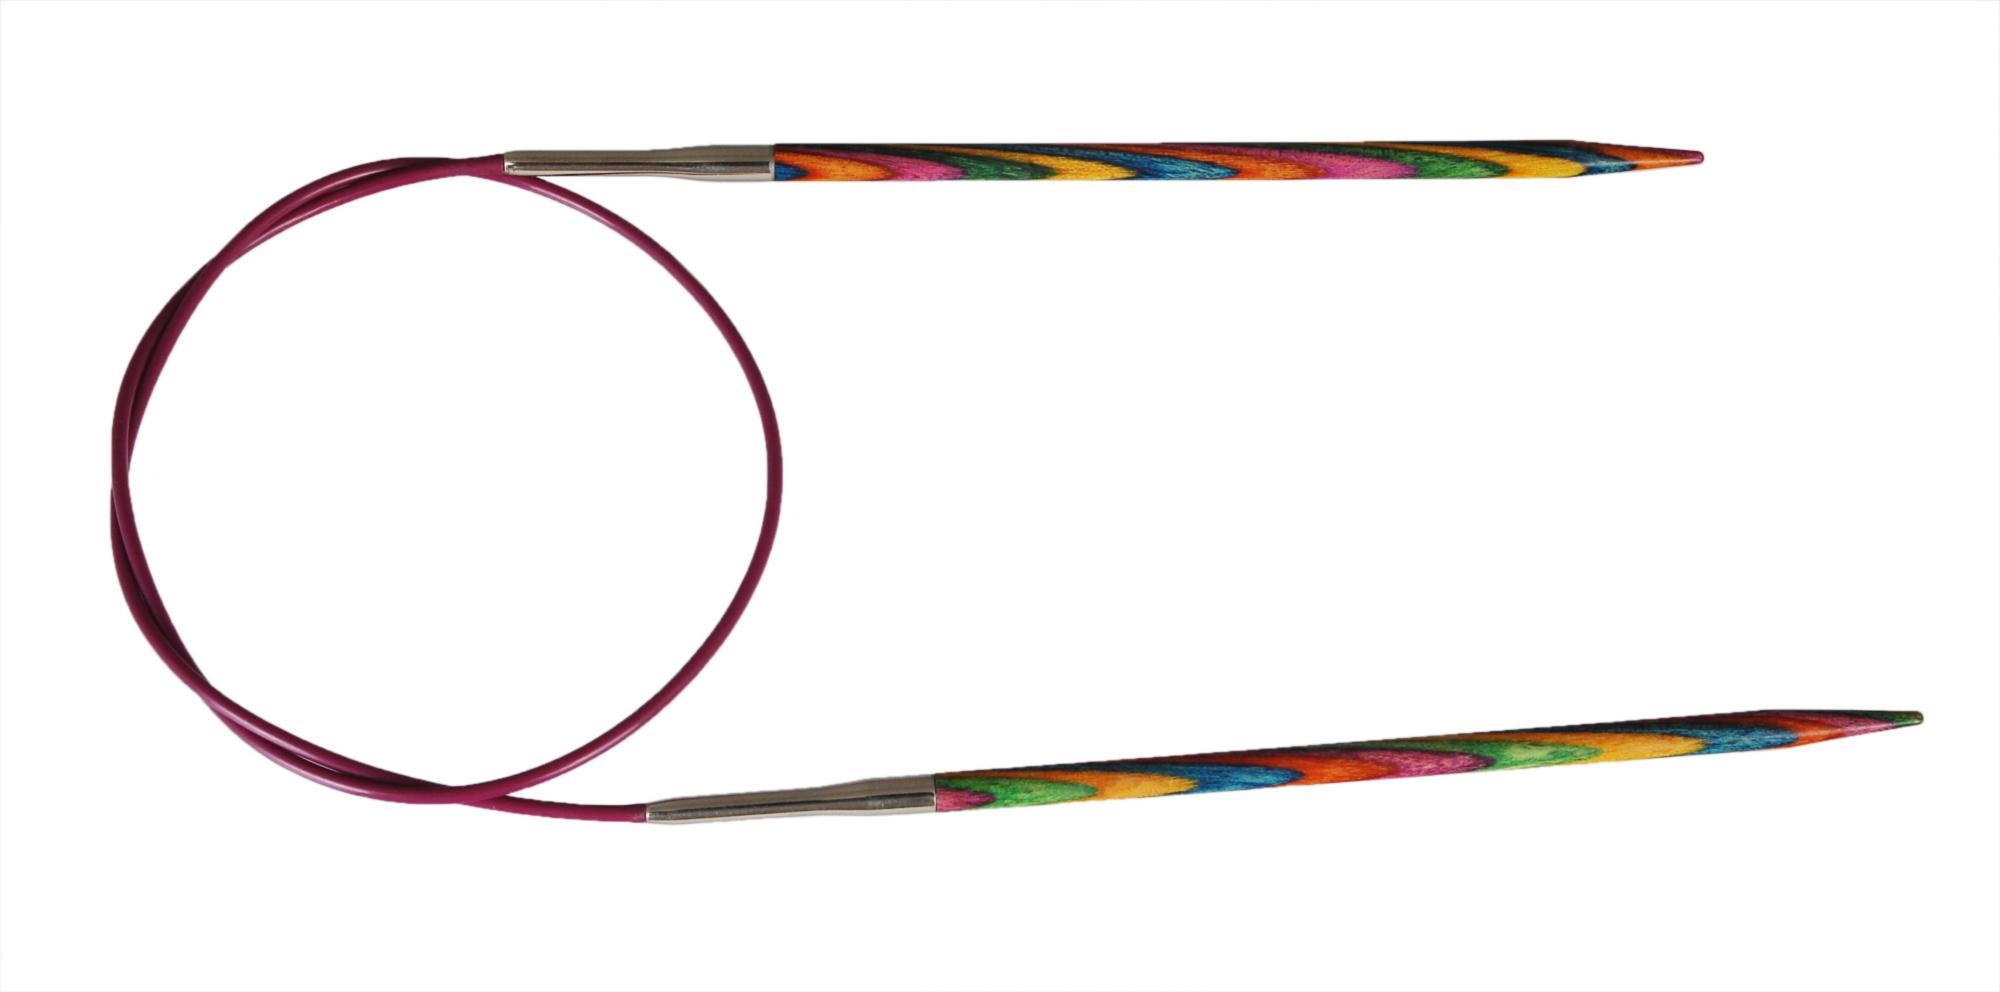 Спицы круговые 80 см Symfonie Wood KnitPro, 21341, 6.00 мм